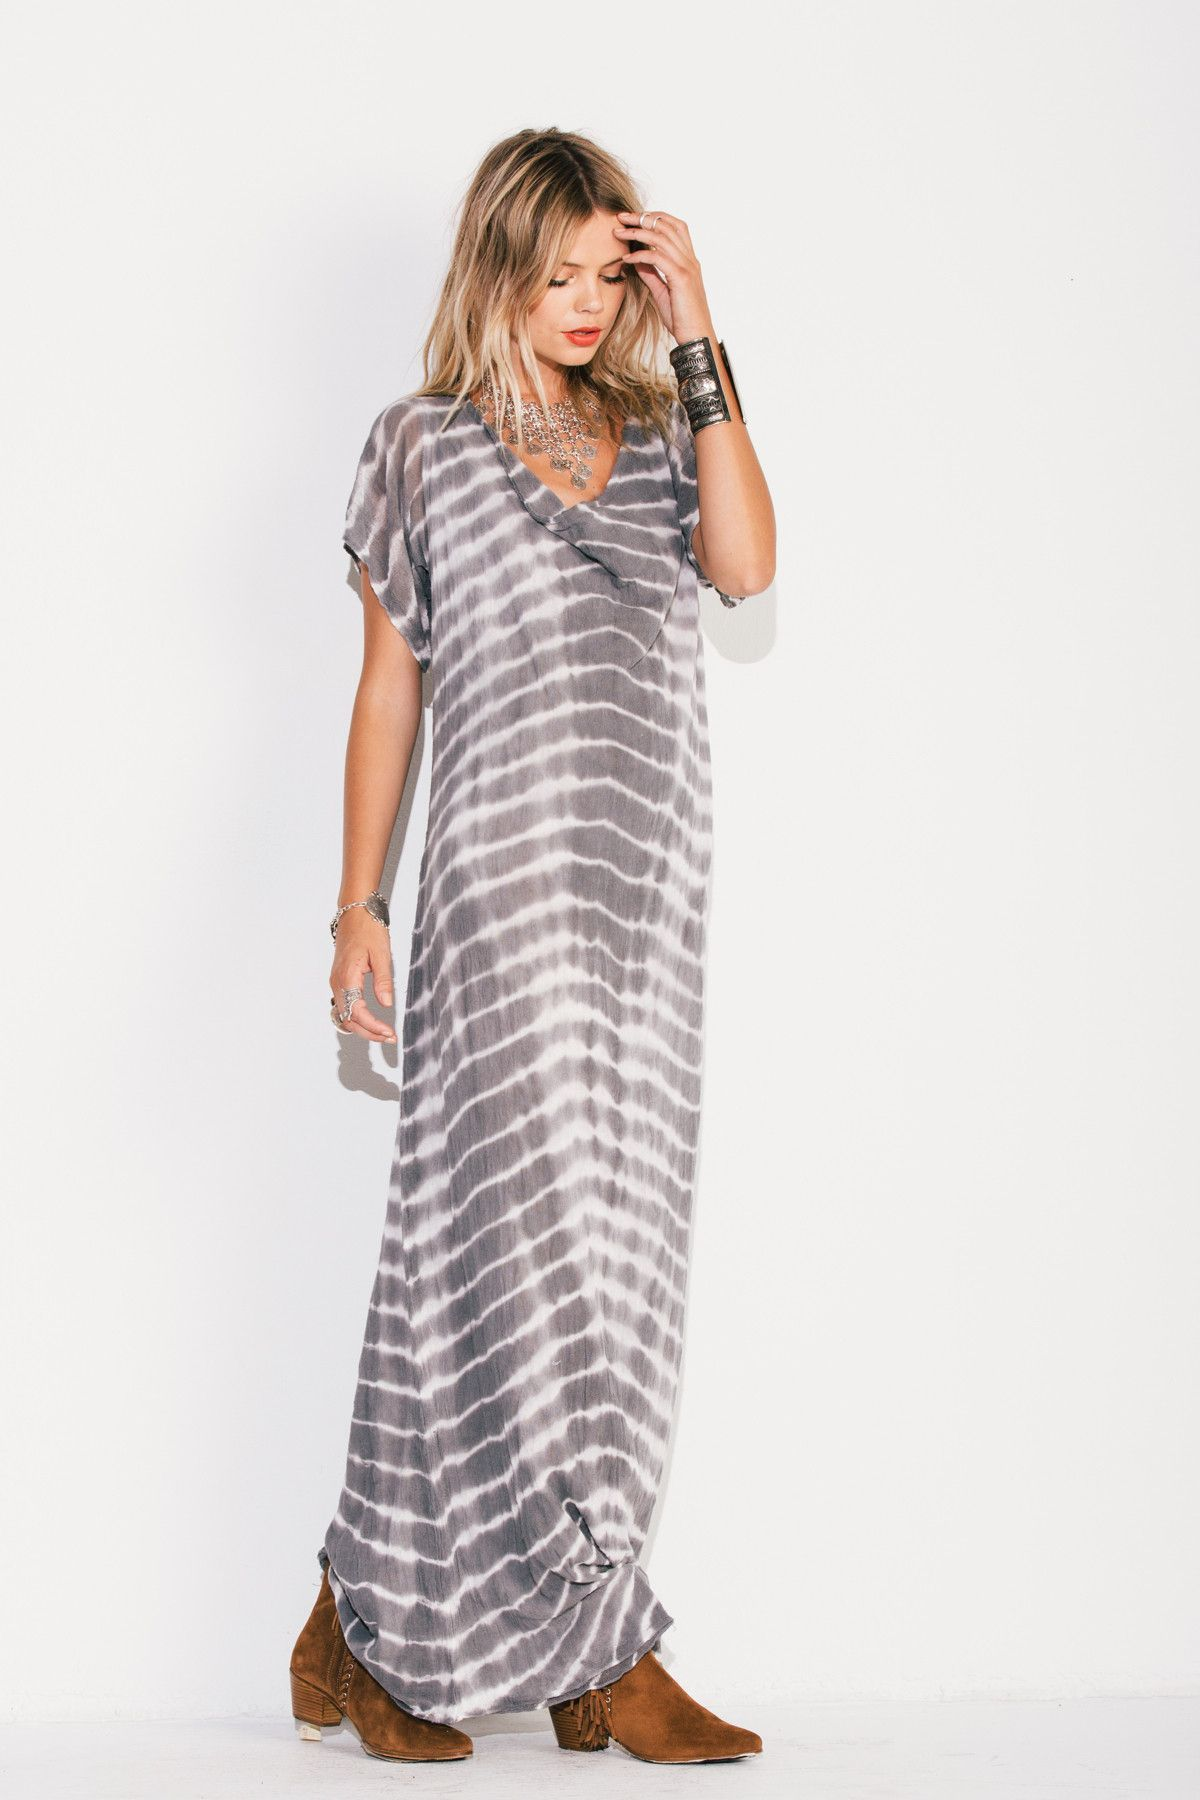 Tropic T-Dress - SPECIAL ORDER